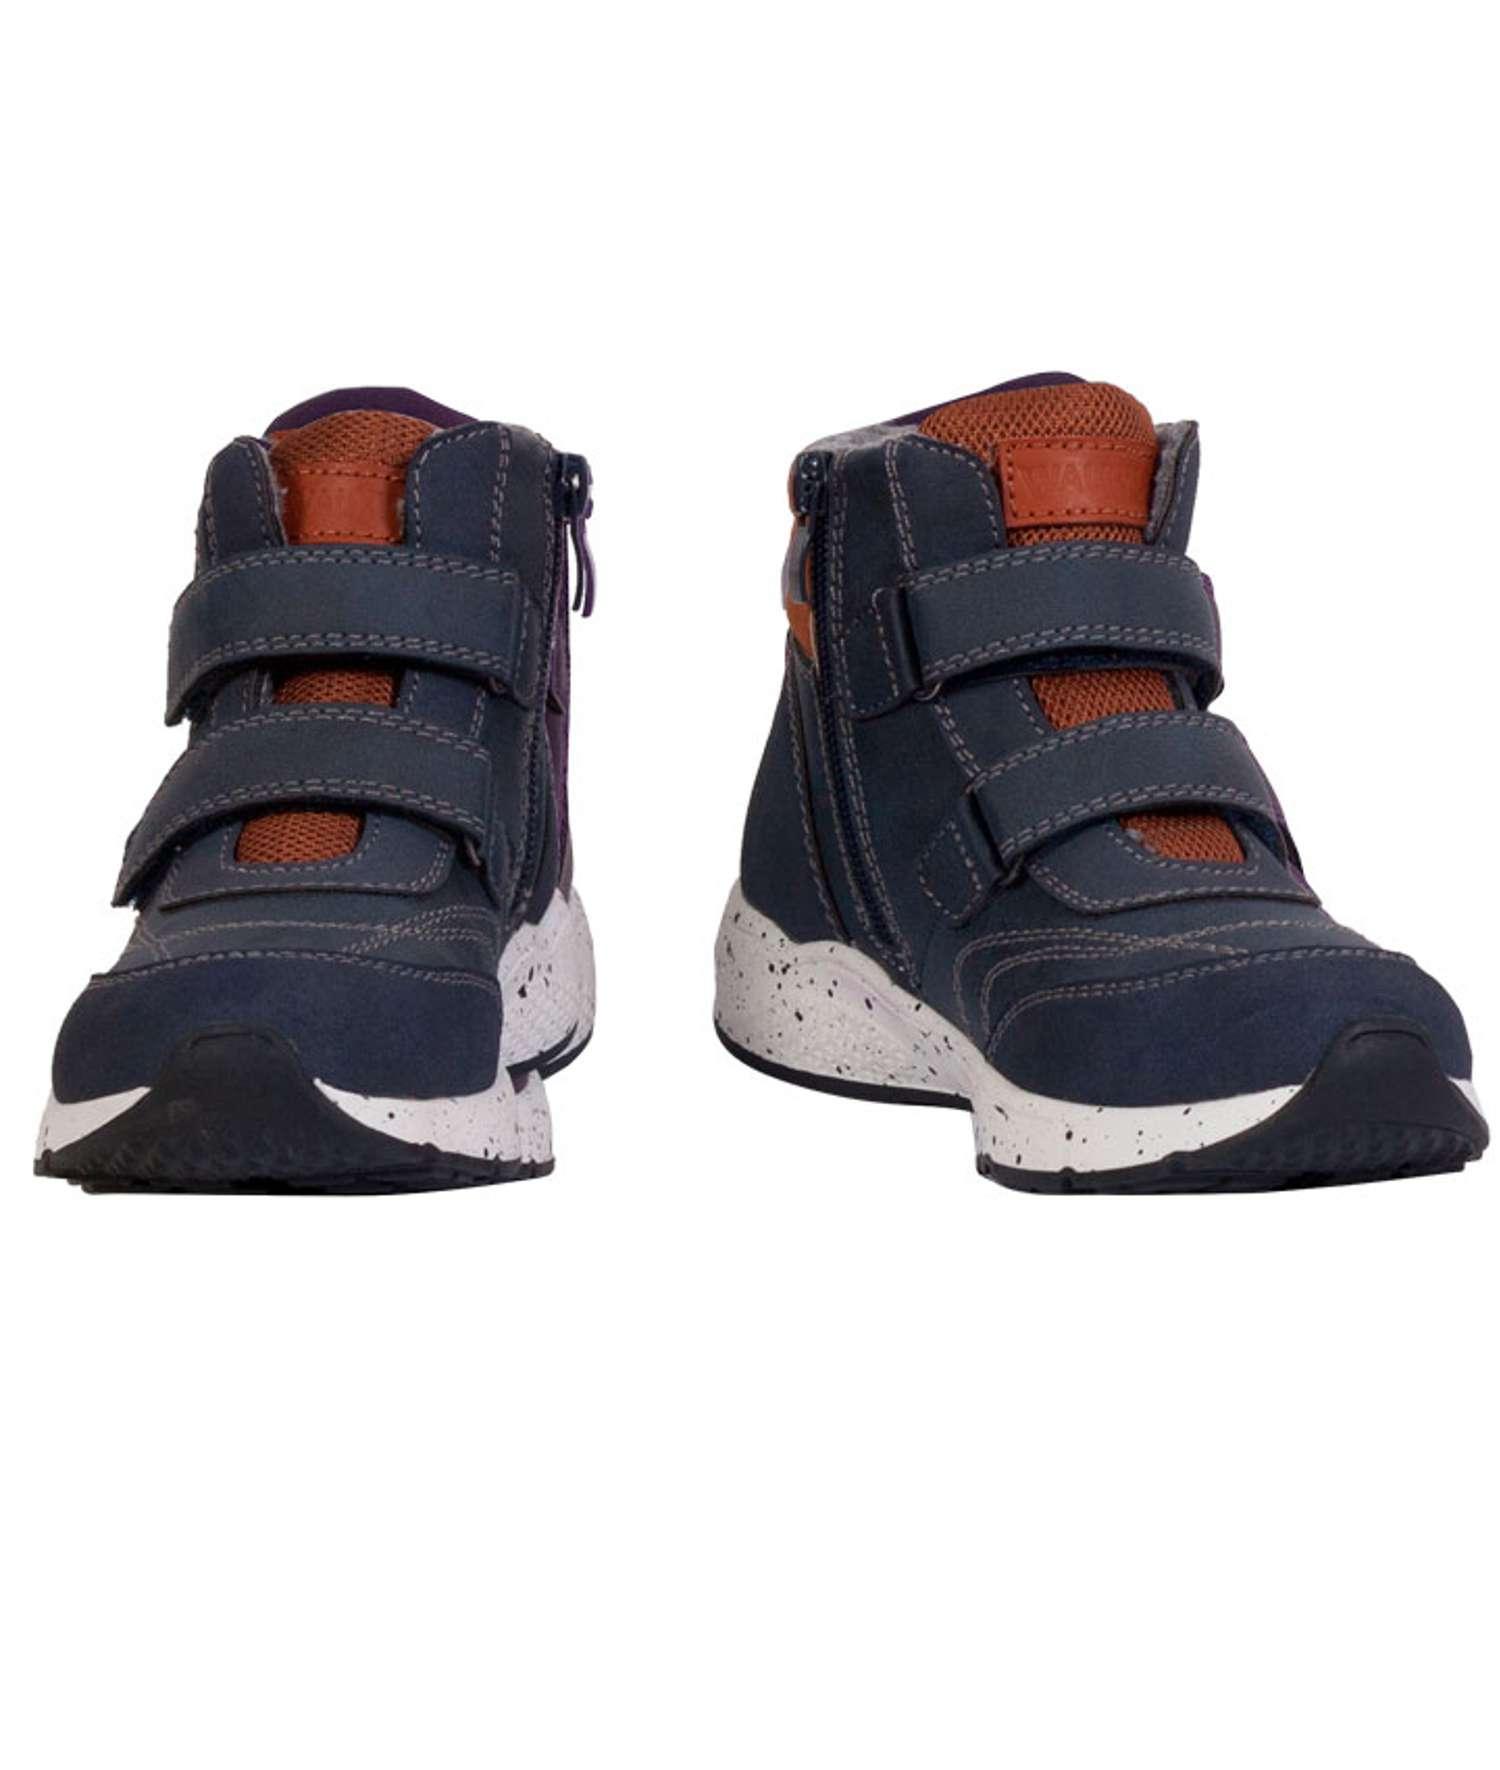 Walkway - Akako børne vinter sneakers - Mørkeblå - Størrelse 27